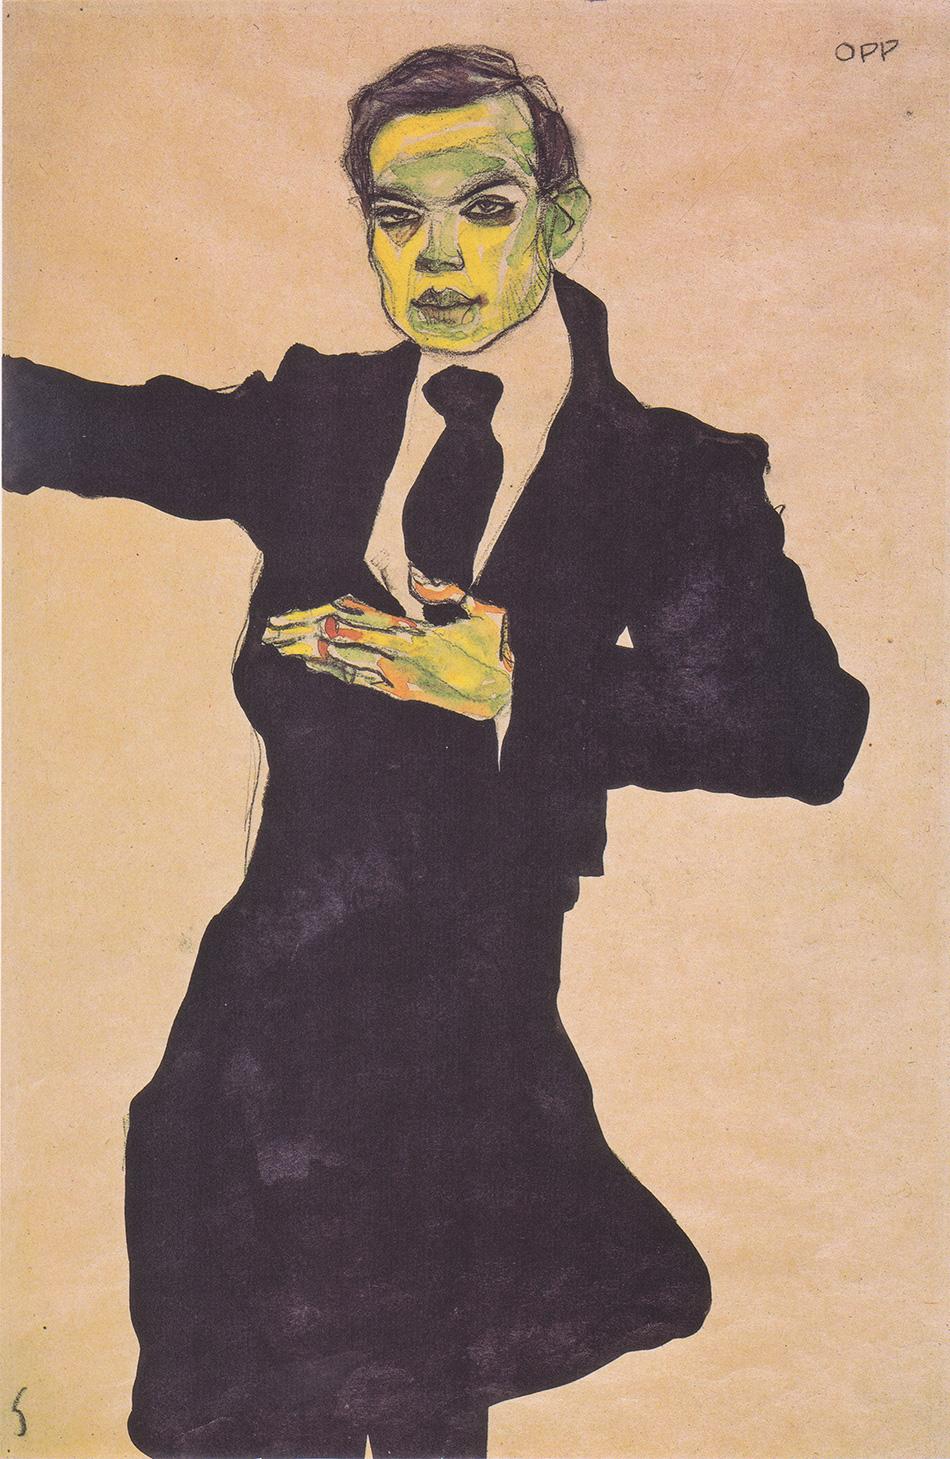 Egon_Schiele_-_Der_Maler_Max_Oppenheimer_-_1910